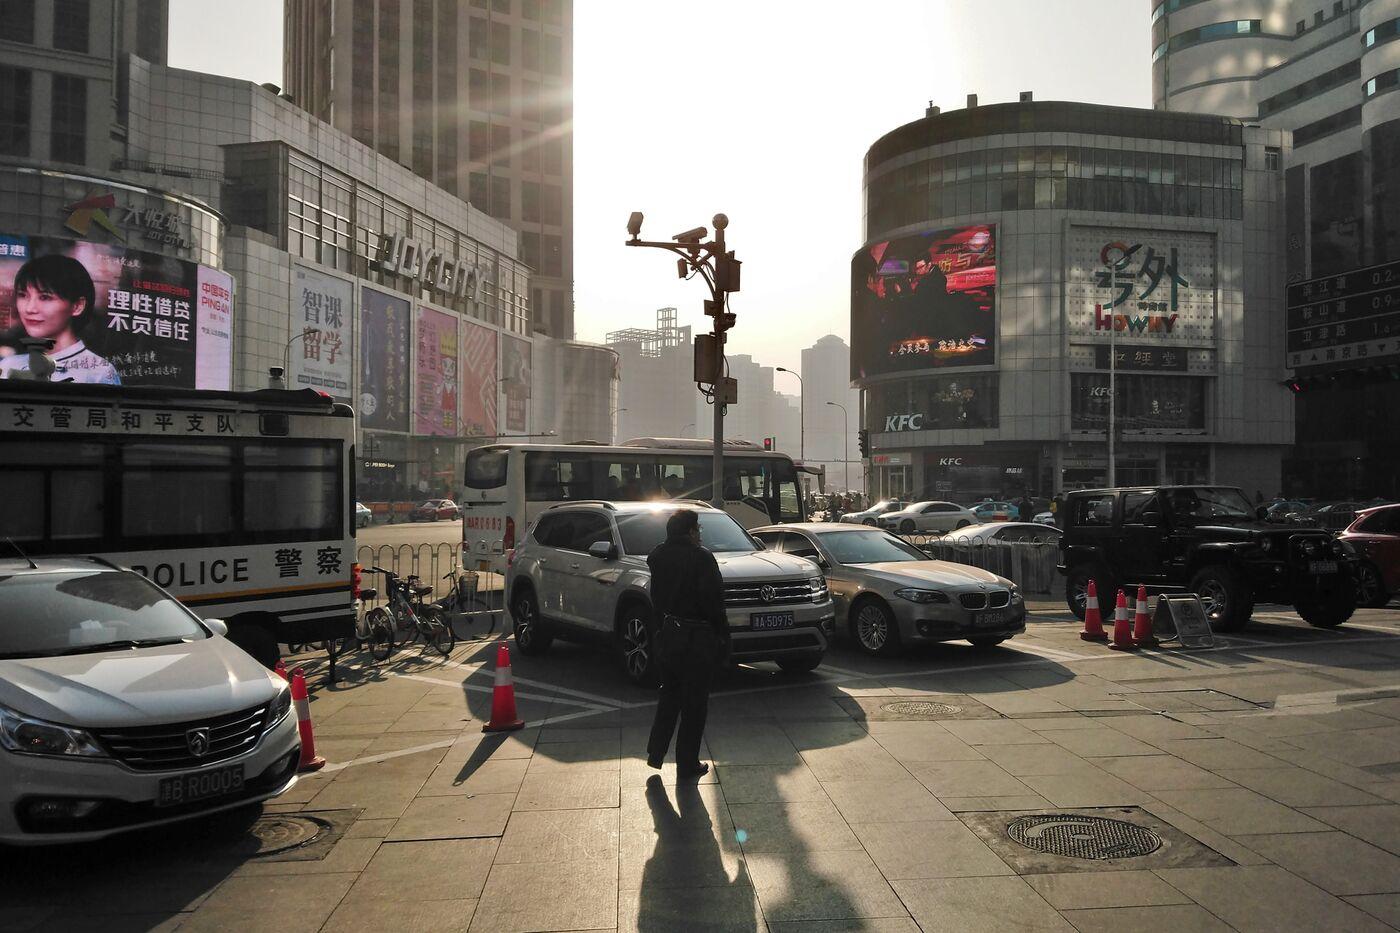 Chính's News: China's Powerful Surveillance State Has Created at